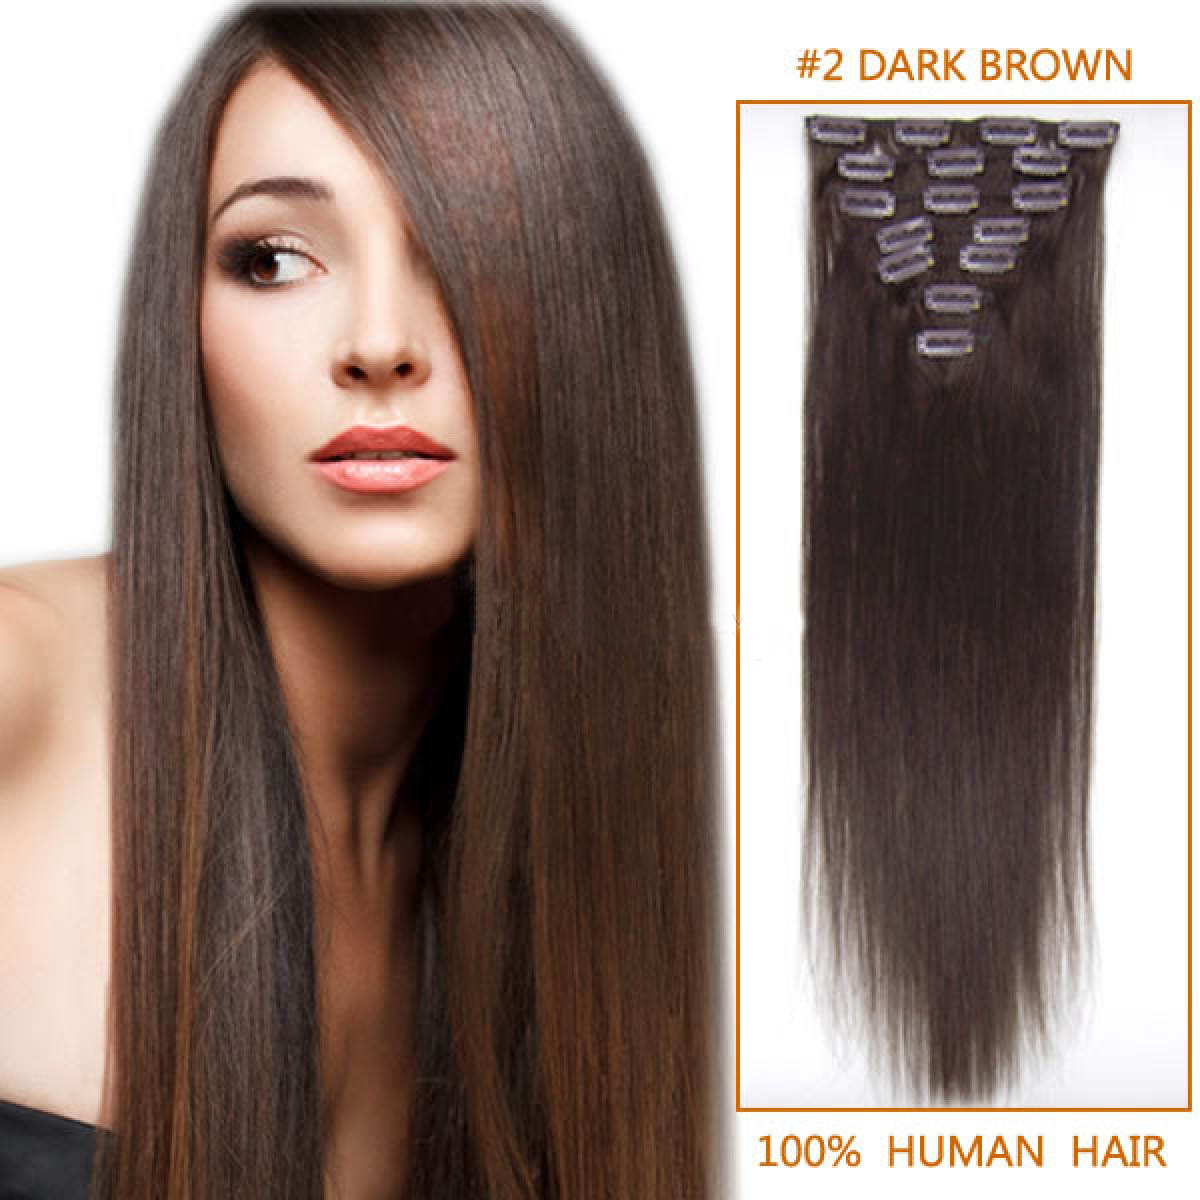 22 Inch 2 Dark Brown Clip In Human Hair Extensions 8pcs